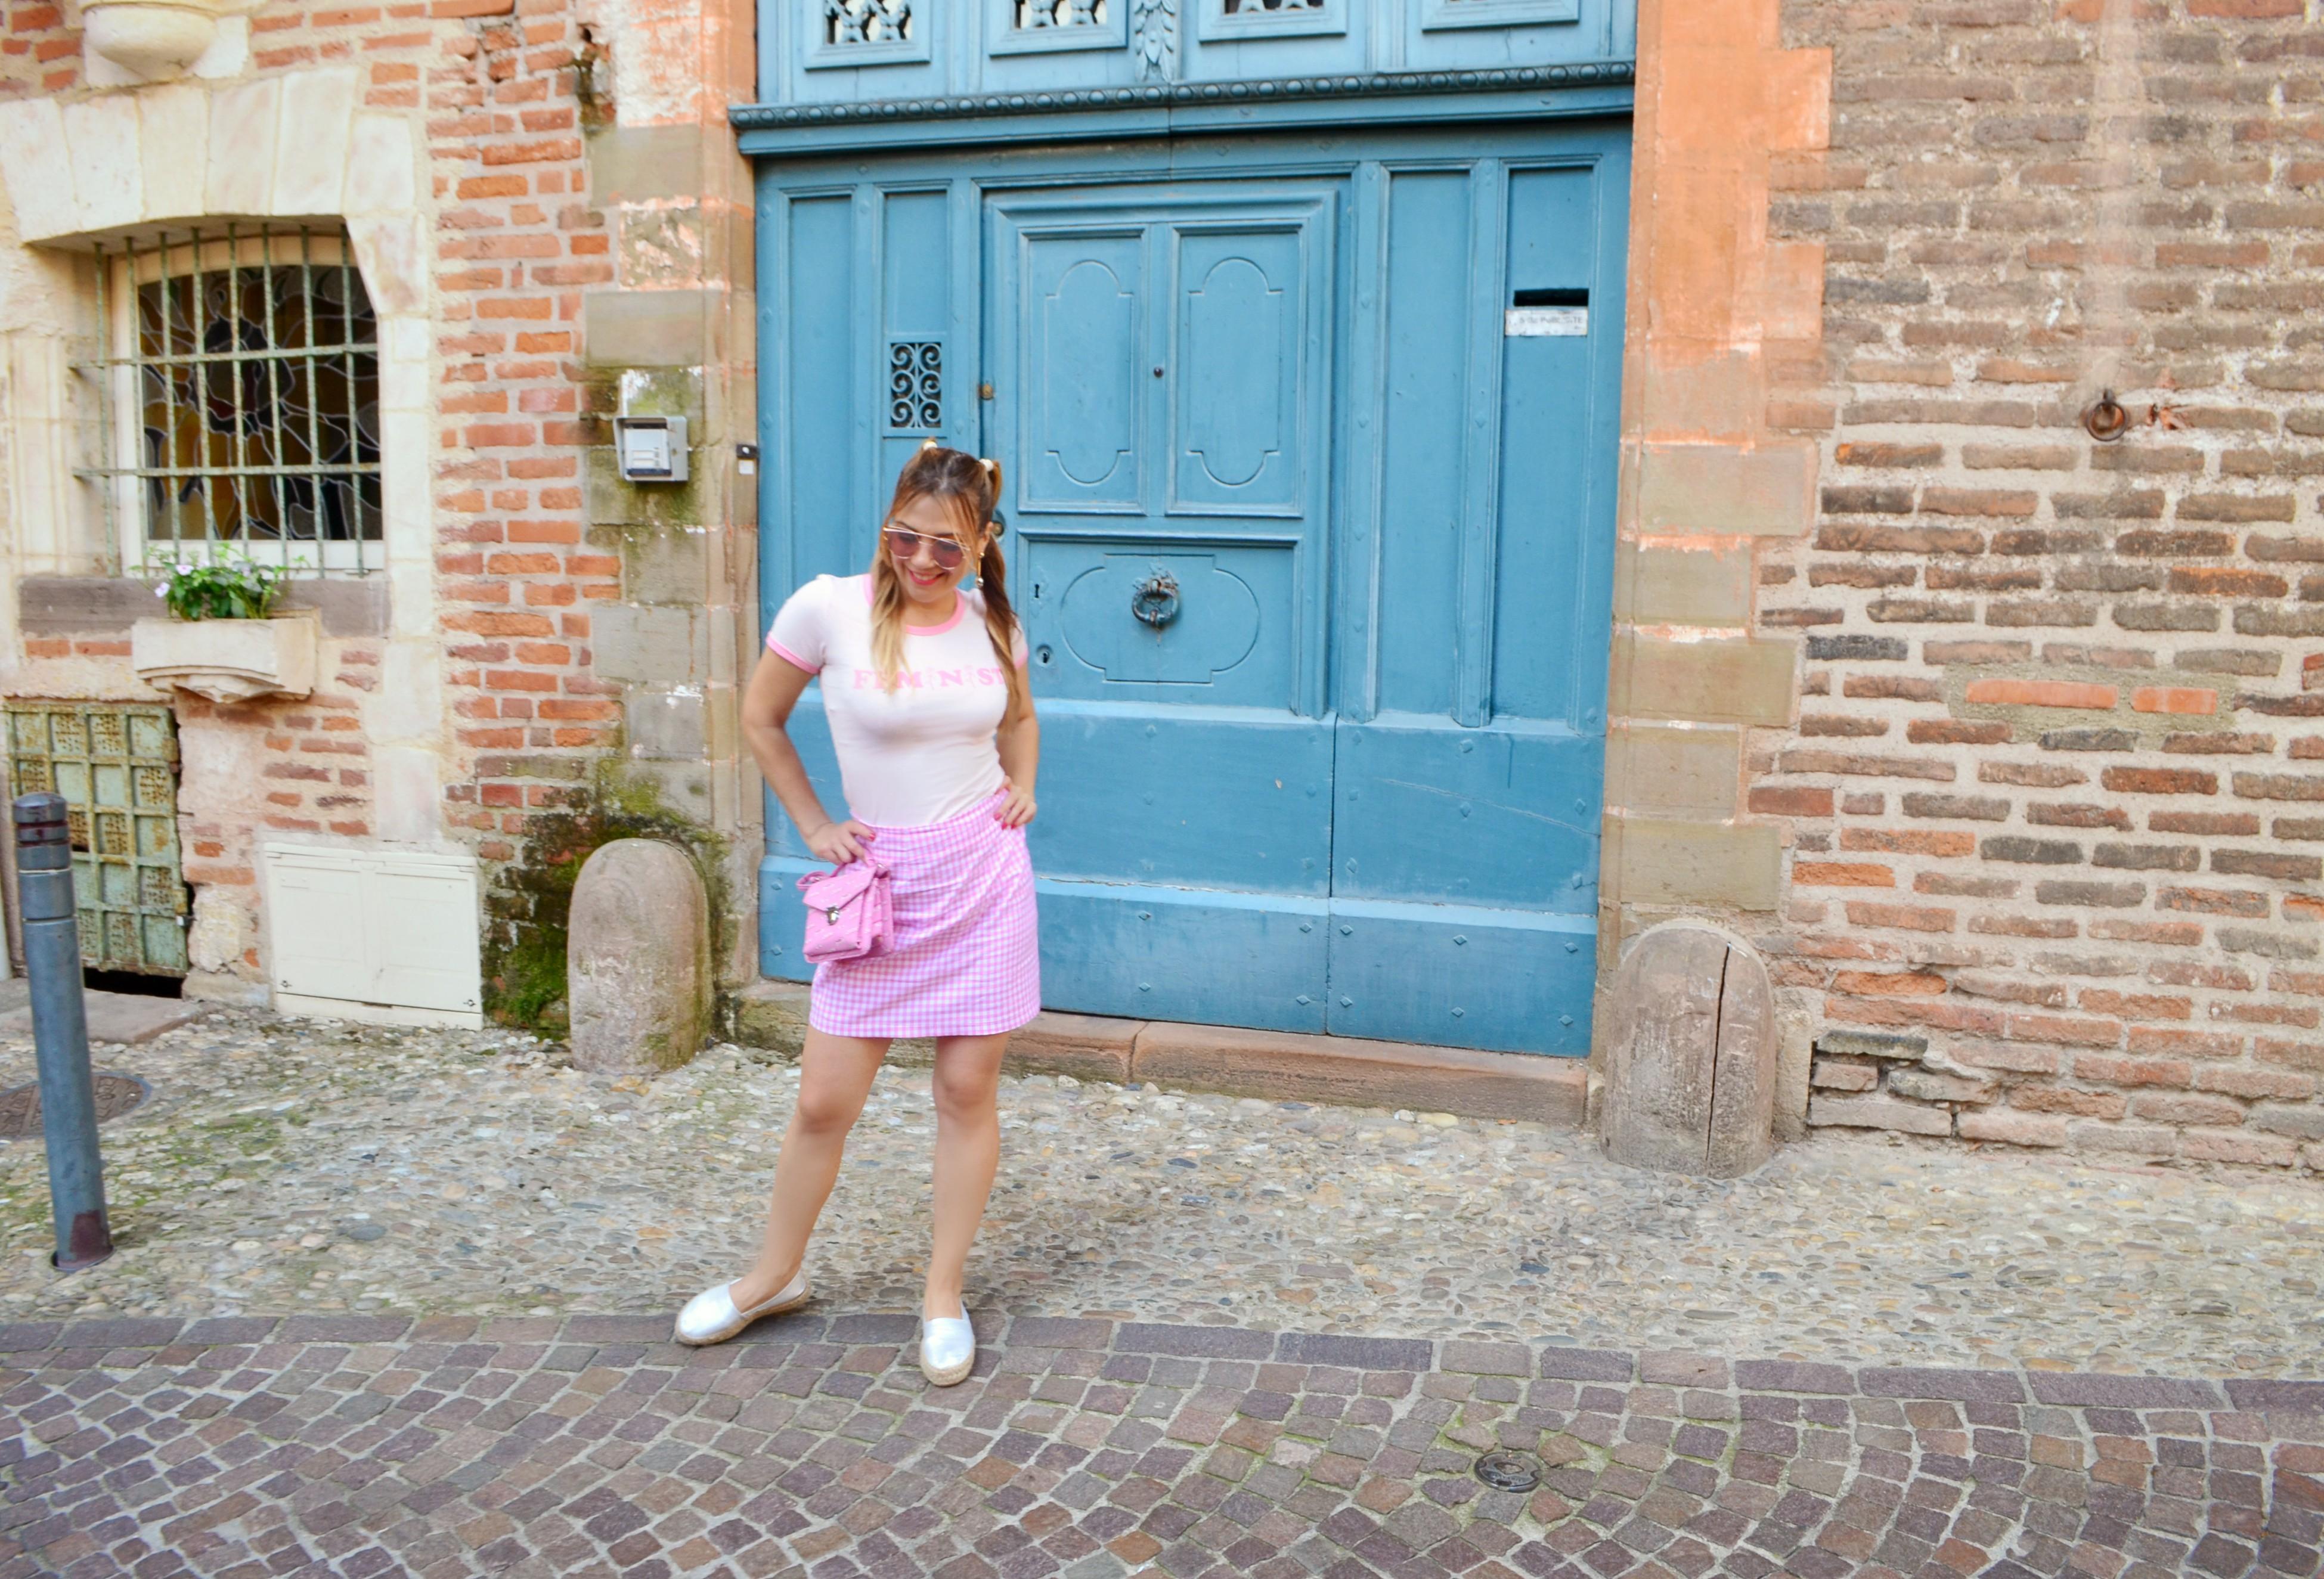 Bolso-Barbie-chica-blog-de-moda-ChicAdicta-influencer-Chic-Adicta-travel-blogger-look-rosa-vichy-outfit-Busonier-PiensaenChic-fashionista-Piensa-en-Chic